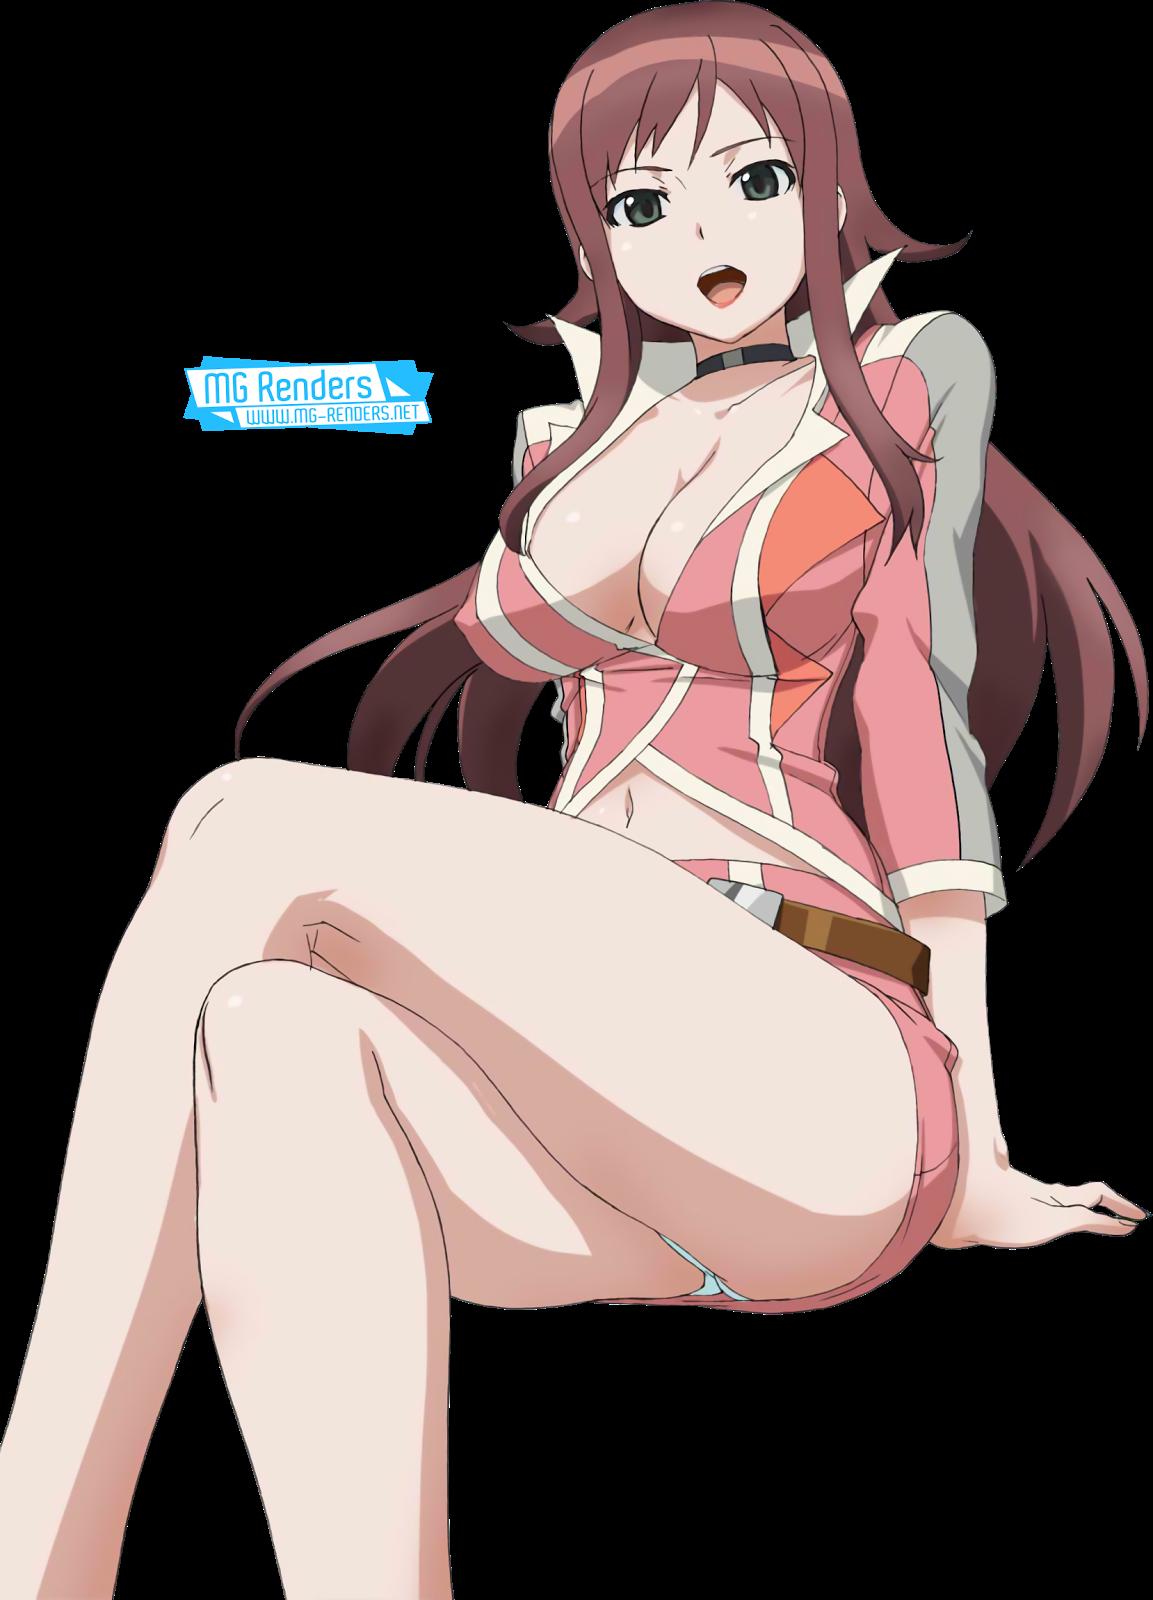 Tags: Anime, Render,  Akana Rui,  Chousoku Henkei Gyrozetter,  Crossed Legs,  Pantsu,  Skirt, PNG, Image, Picture